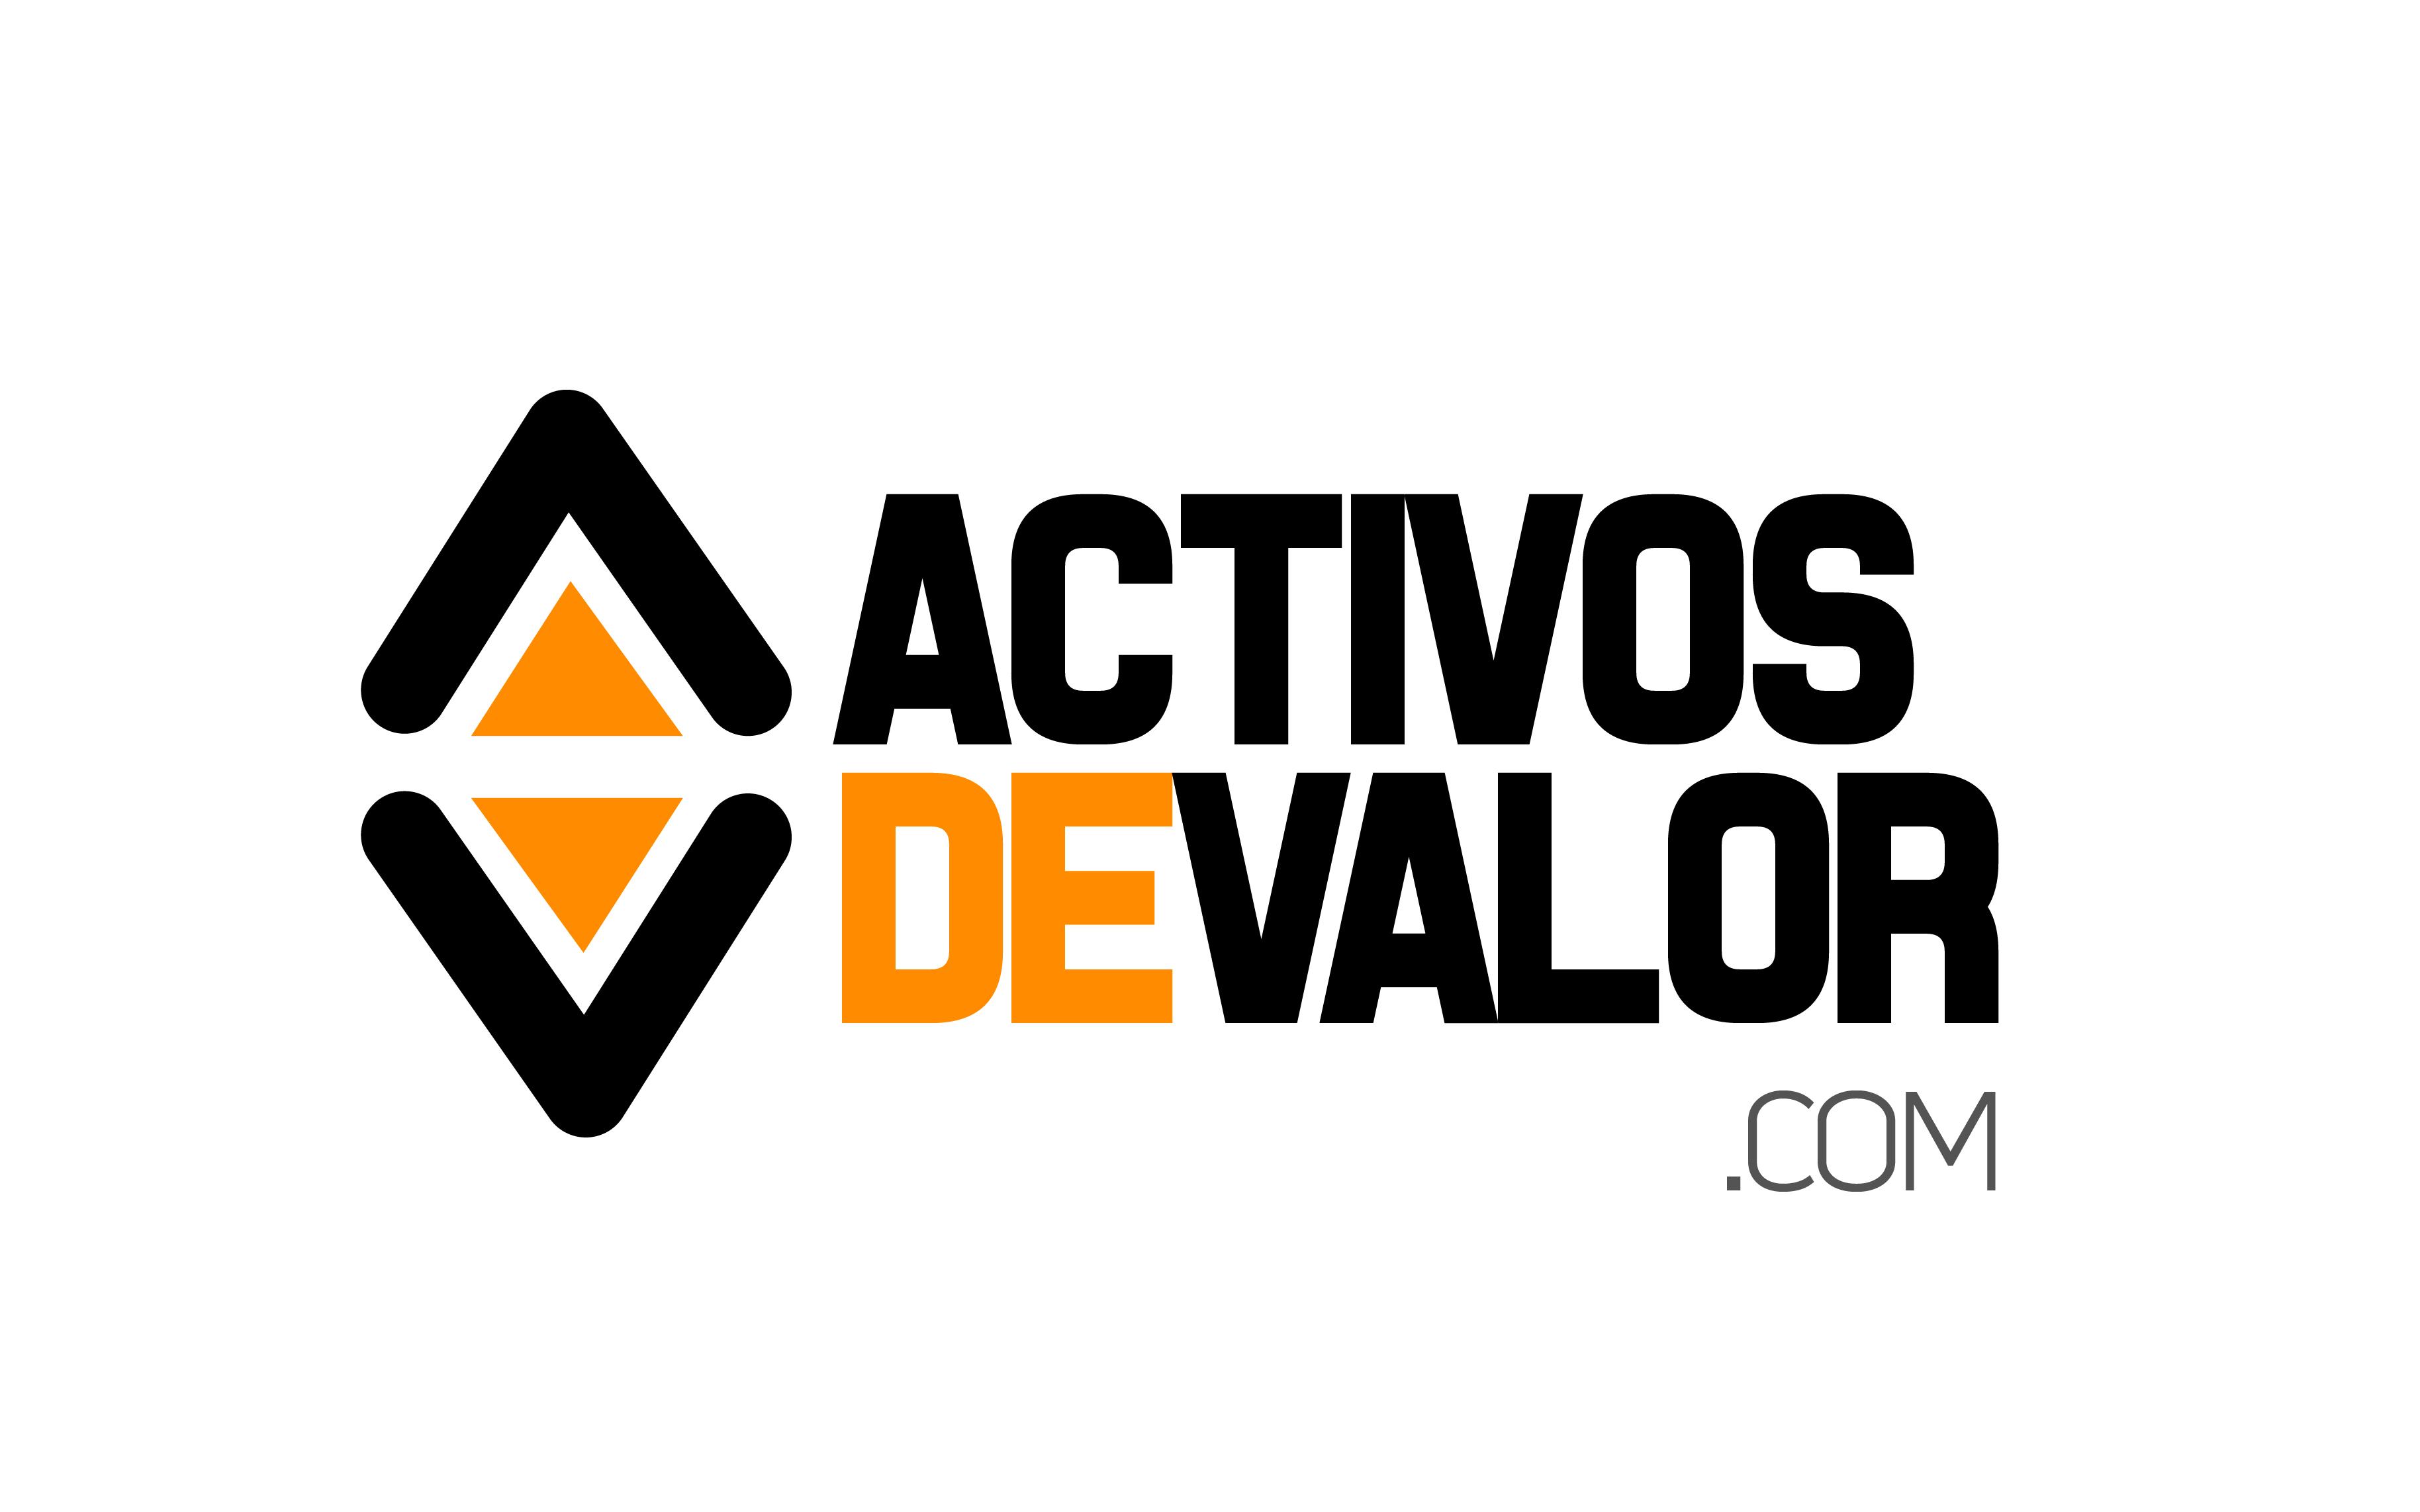 Activos de Valor